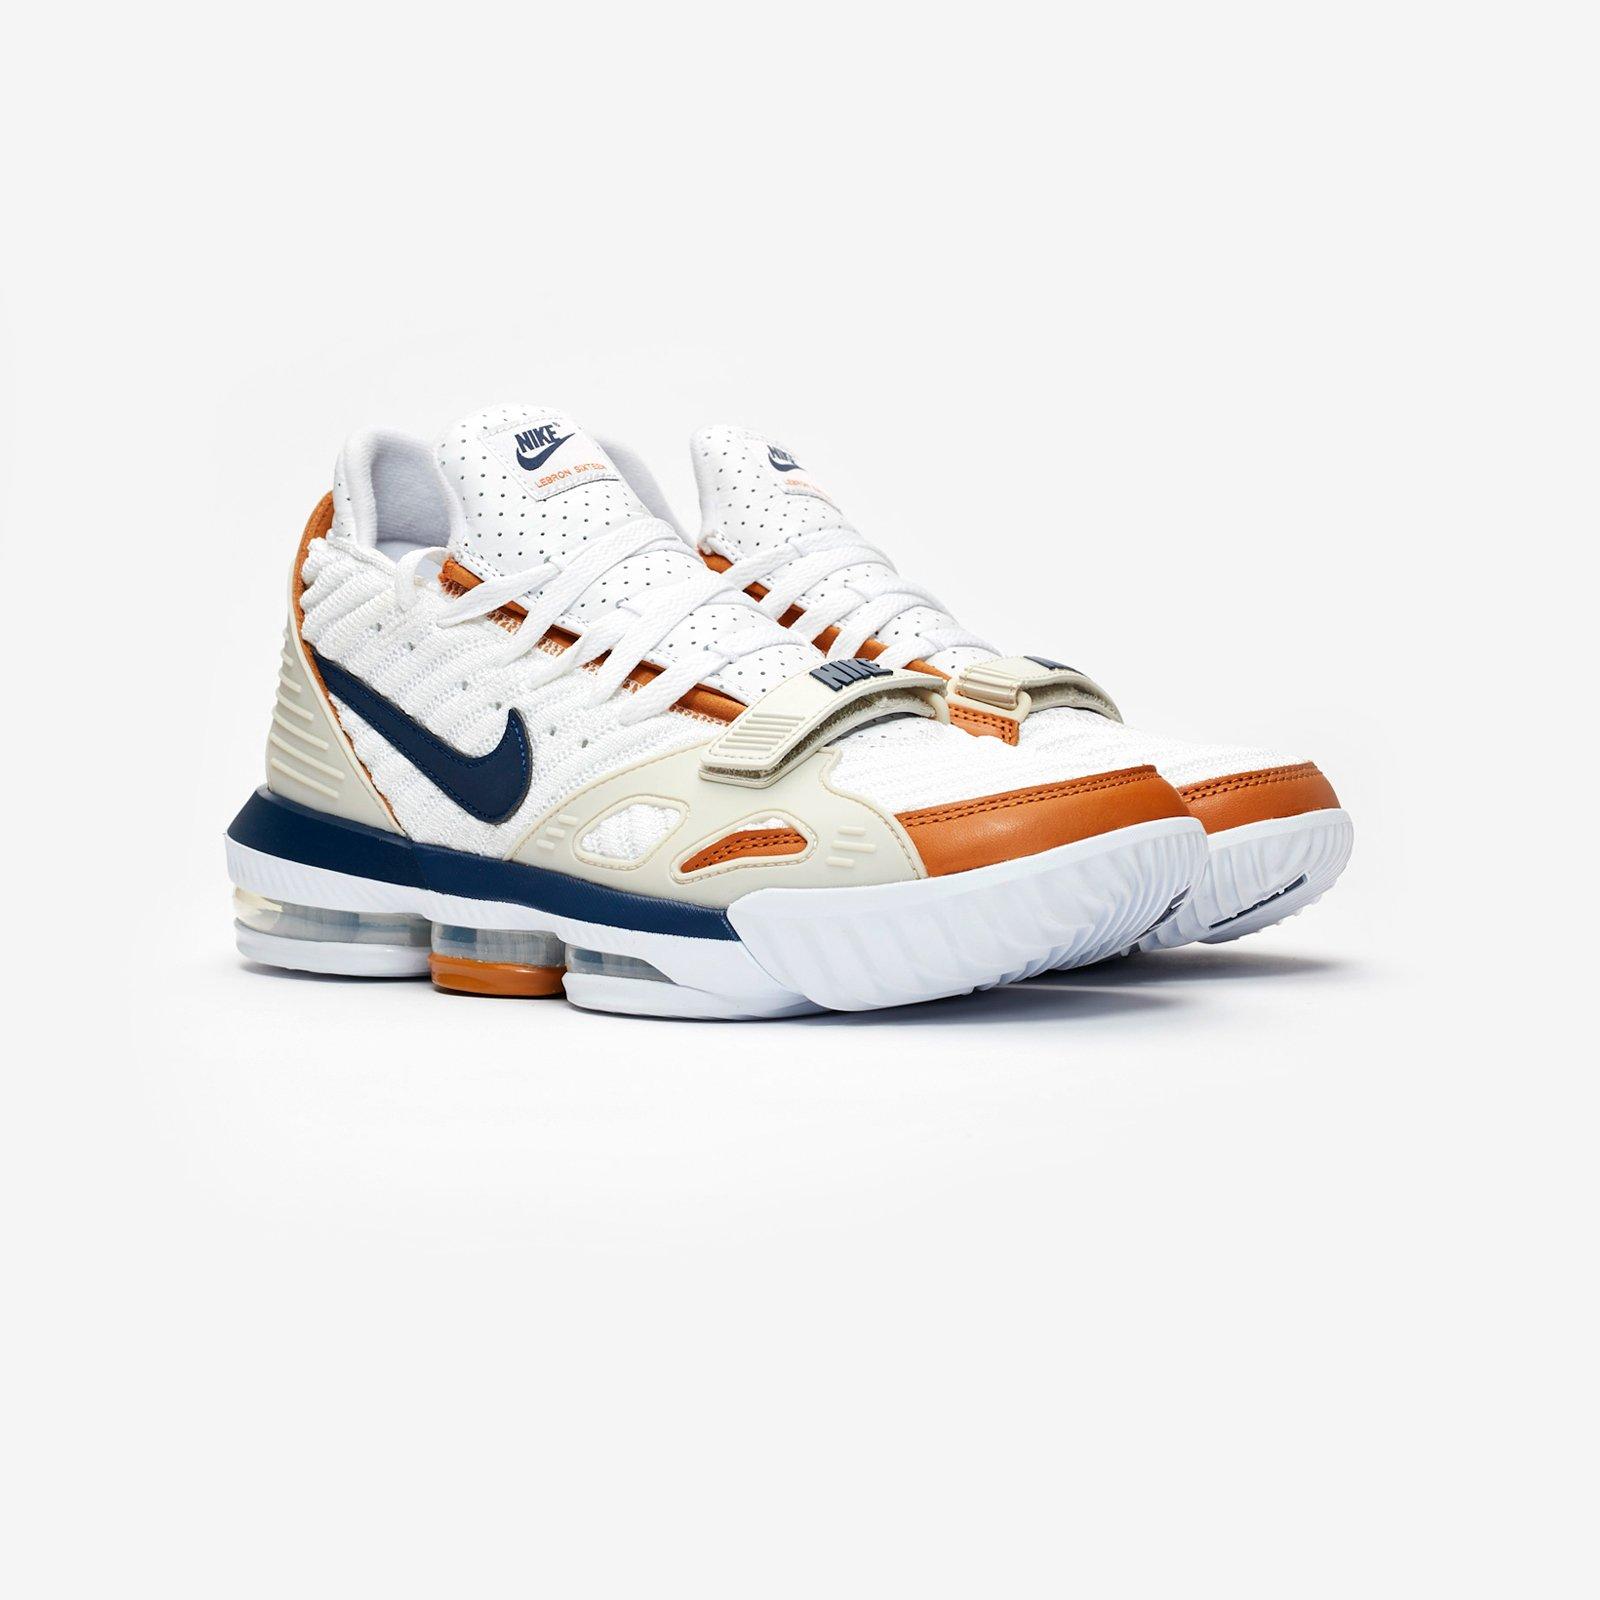 0b0e826aa2b Nike LeBron XVI - Cd7089-100 - Sneakersnstuff